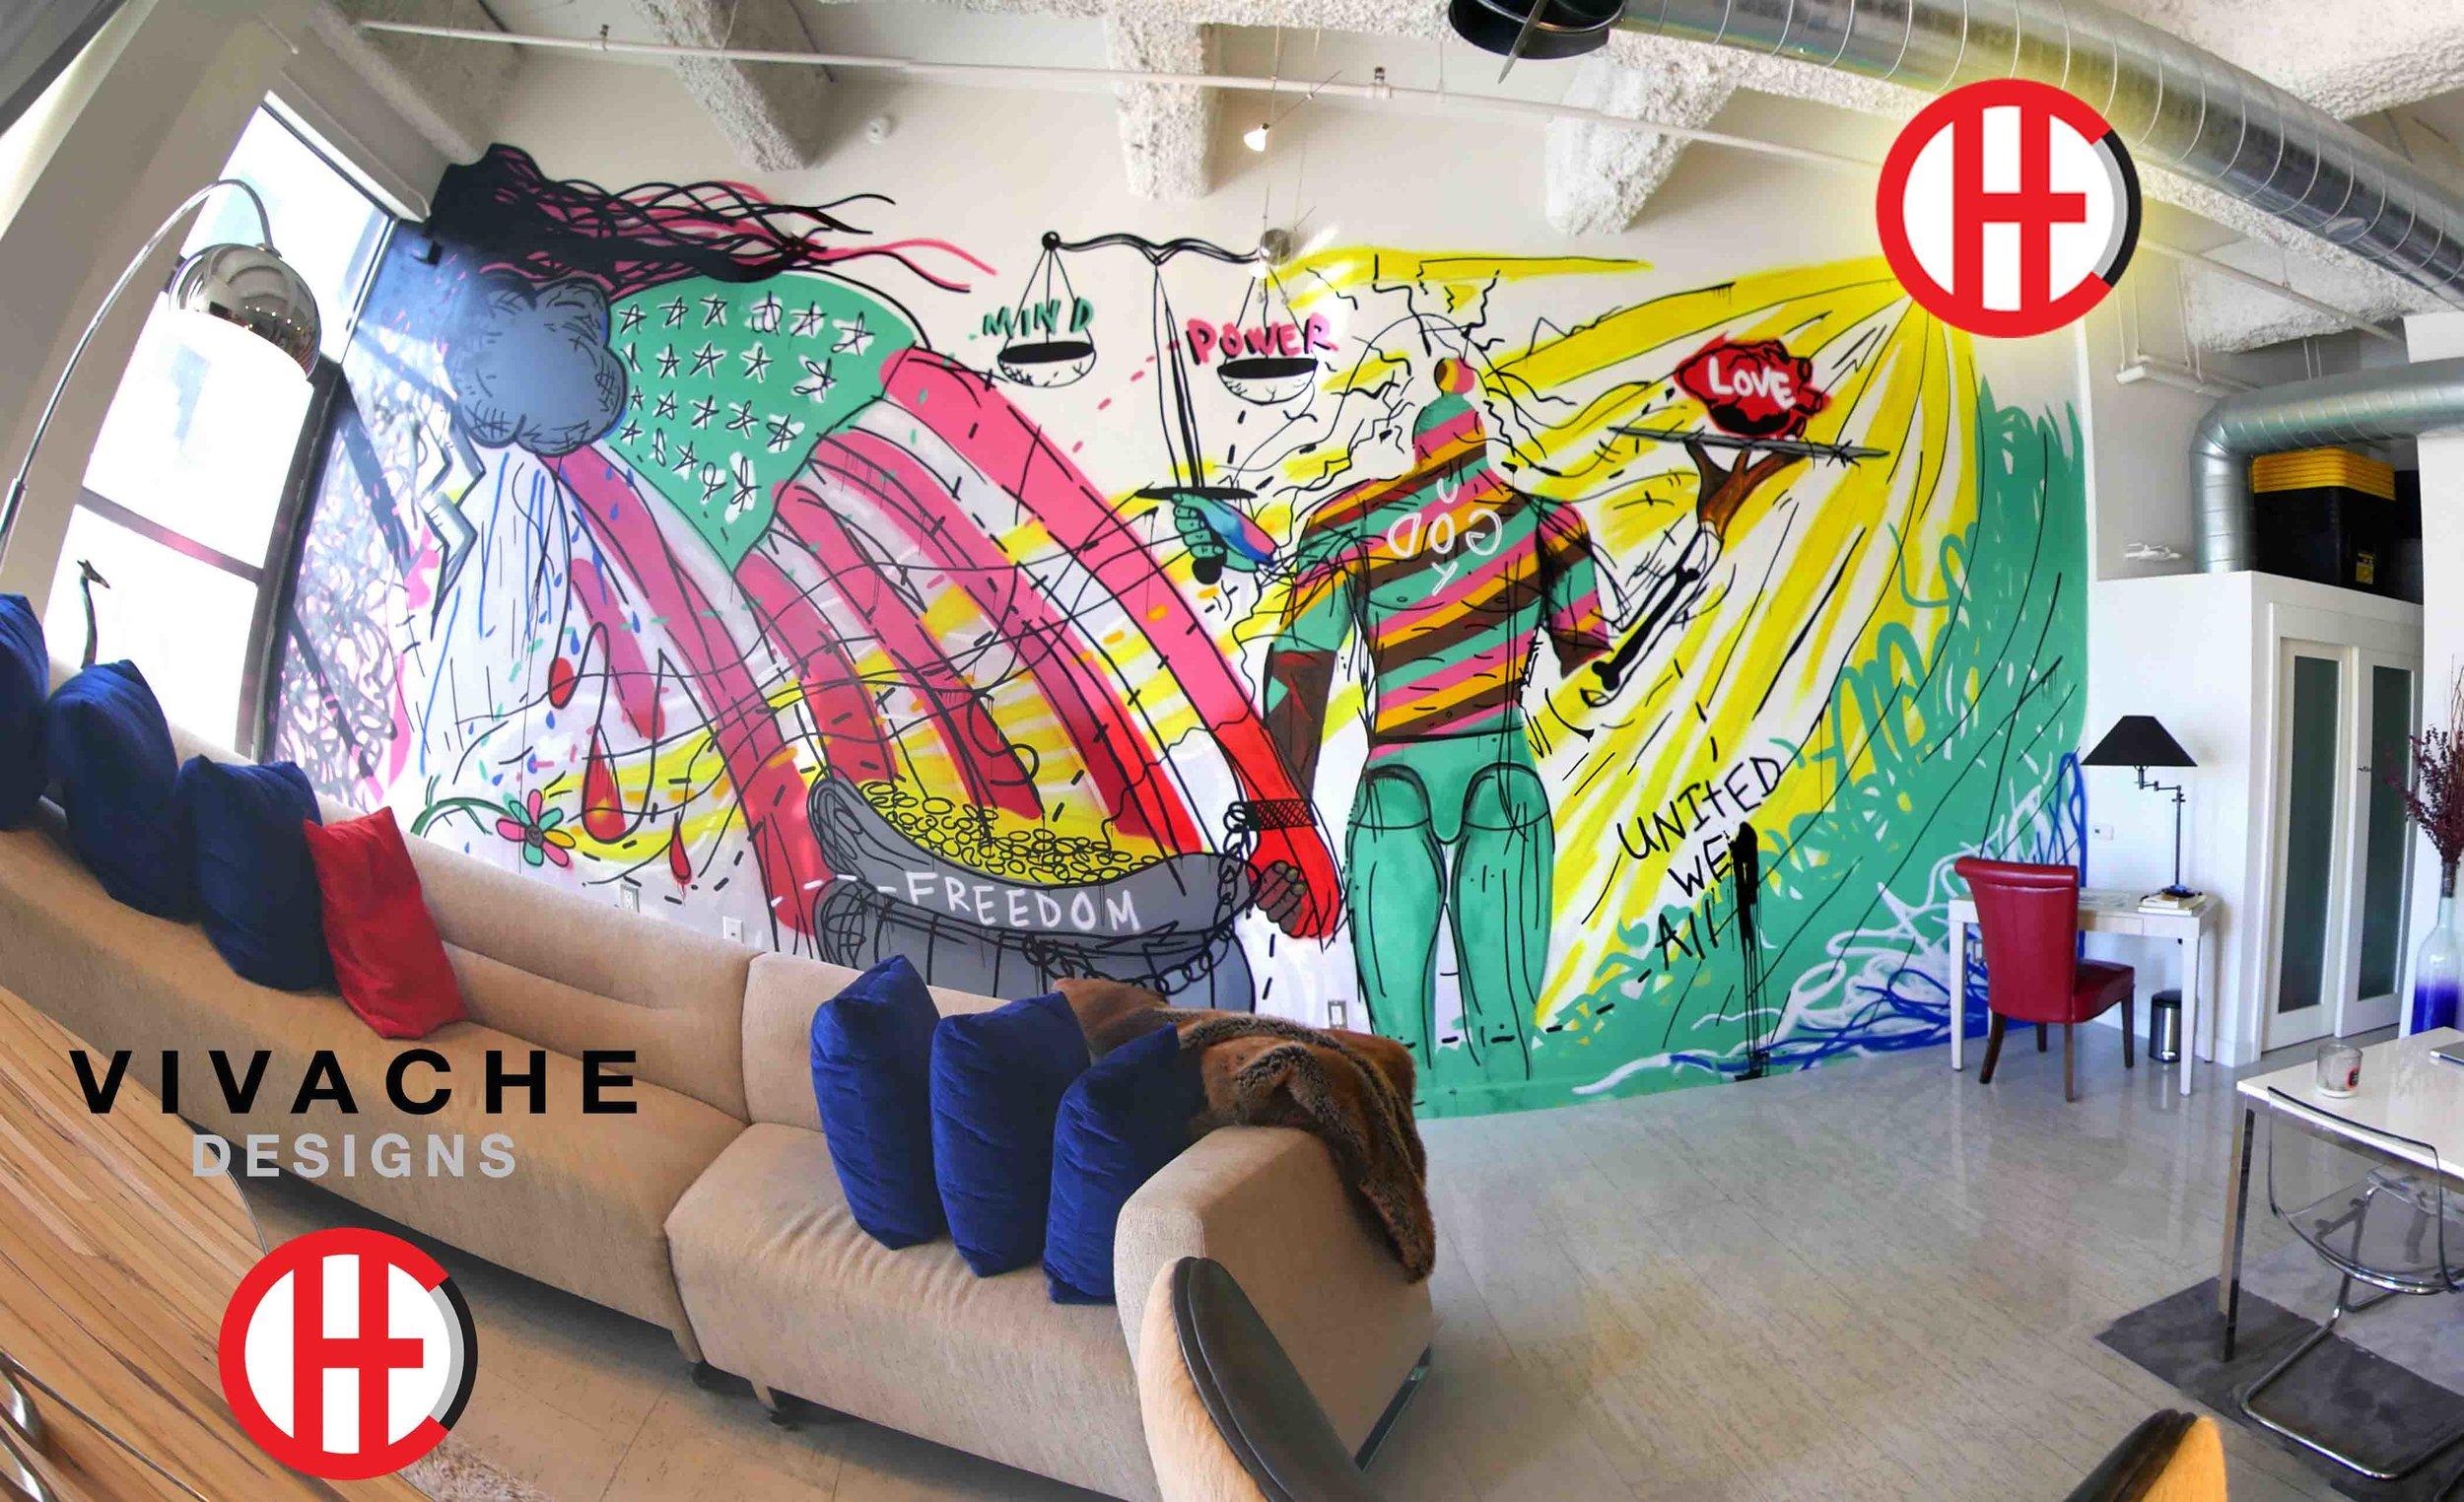 Mural Painter LA Vivache Designs Mural Painter Los Angeles.jpg